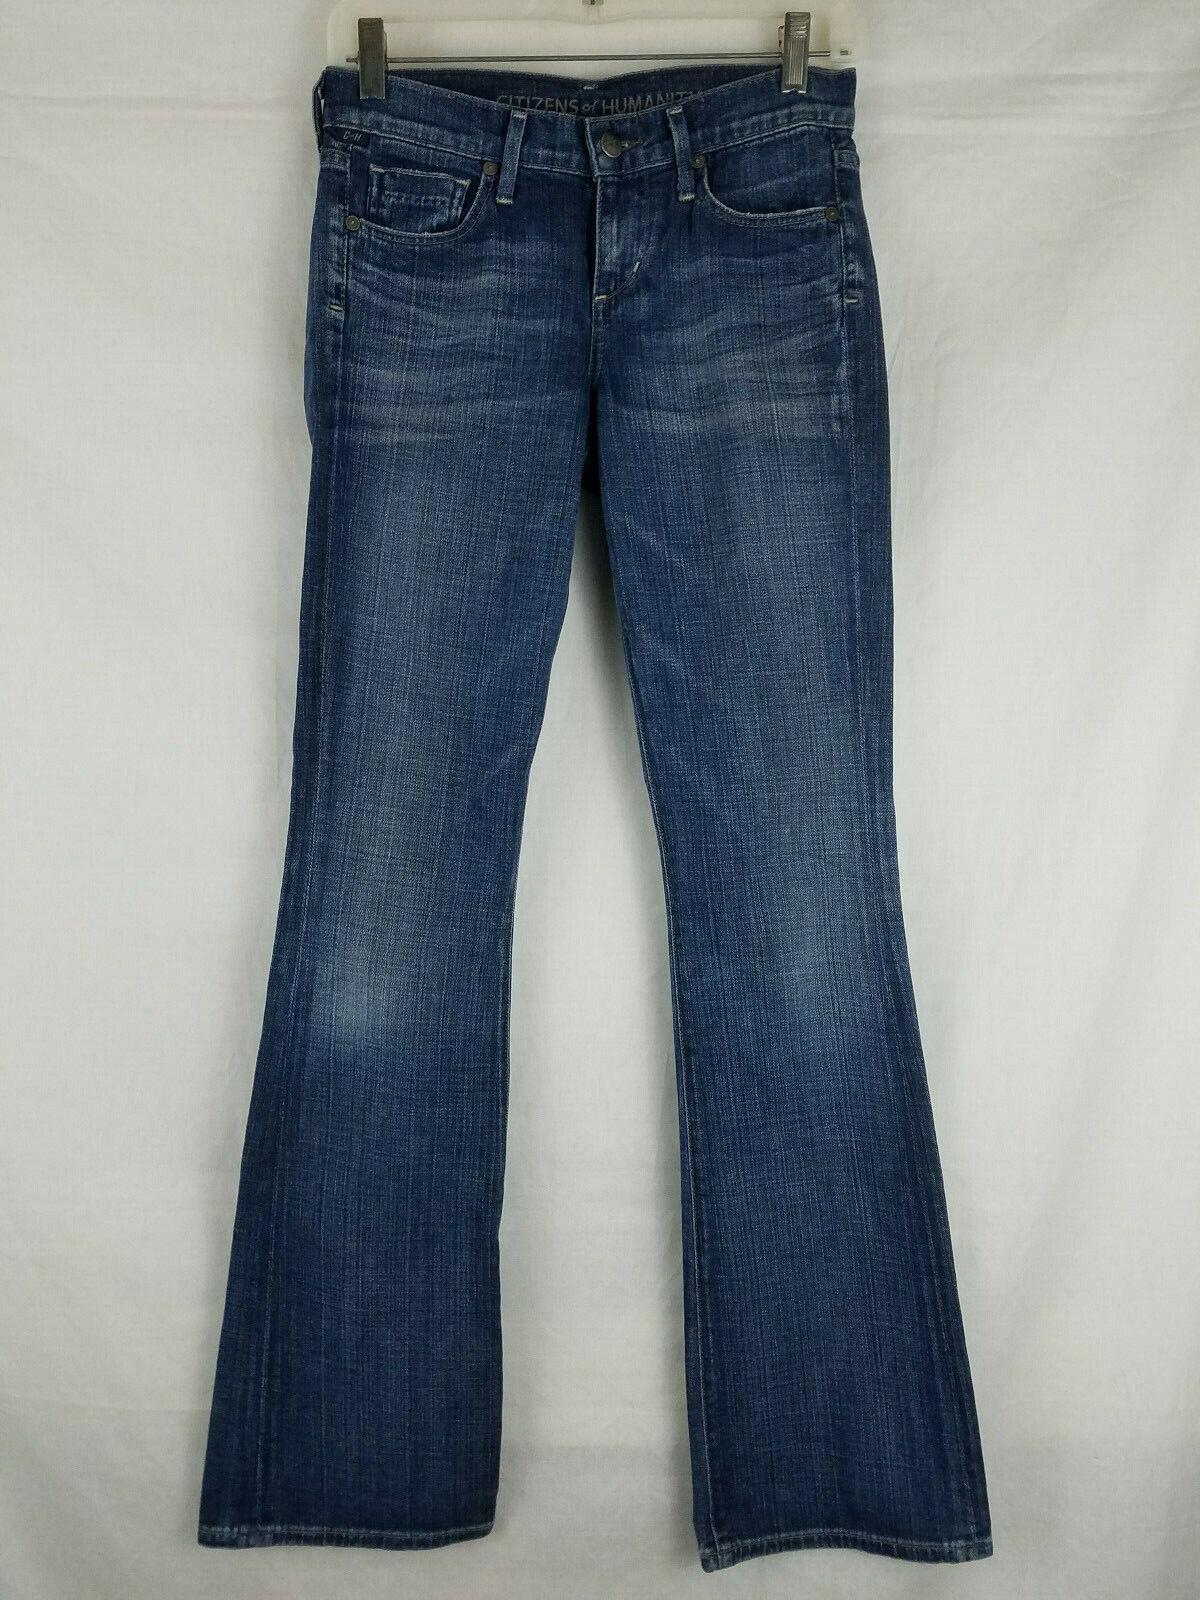 Citizens of Humanity Dita Boot Cut Petite Womens Denim bluee Jeans size 24 x 33